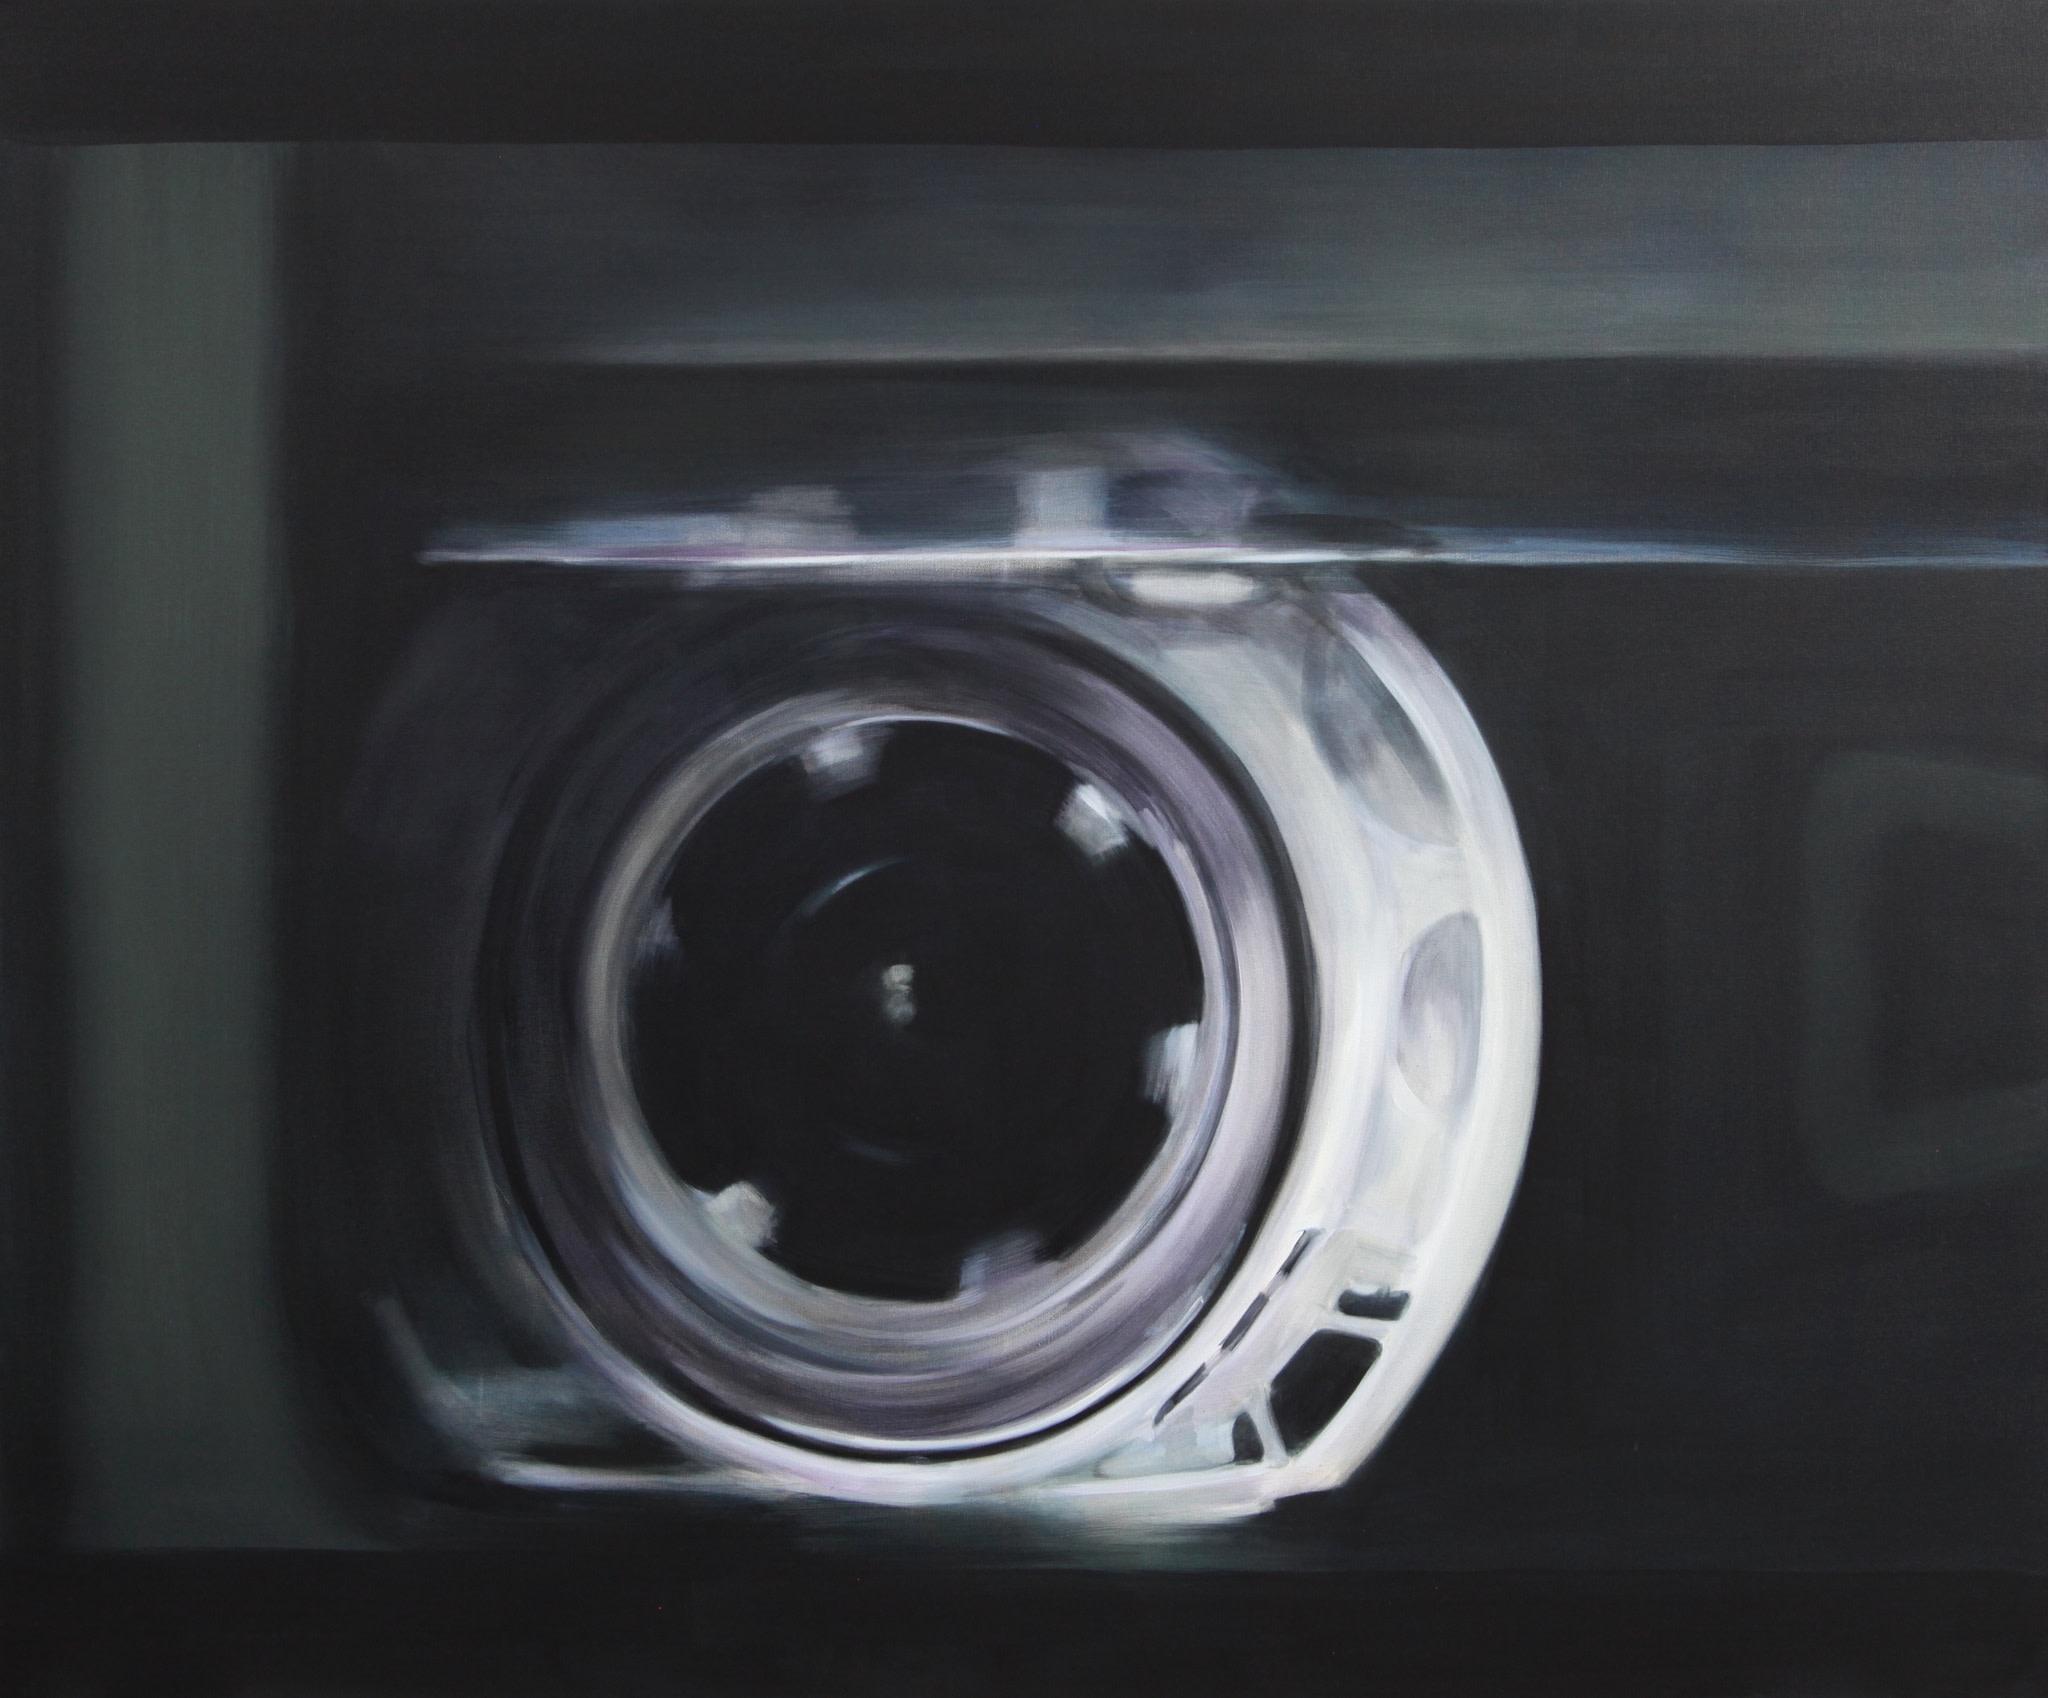 <span class=&#34;link fancybox-details-link&#34;><a href=&#34;/artists/14-rachel-lancaster/works/8786/&#34;>View Detail Page</a></span><div class=&#34;artist&#34;><strong>Rachel Lancaster</strong></div> <div class=&#34;title&#34;>untitled, 2015</div> <div class=&#34;medium&#34;>Oil on canvas</div> <div class=&#34;dimensions&#34;>154 x 183 cm<br />60 5/8 x 72 1/8 in</div><div class=&#34;copyright_line&#34;>Copyright The Artist</div>